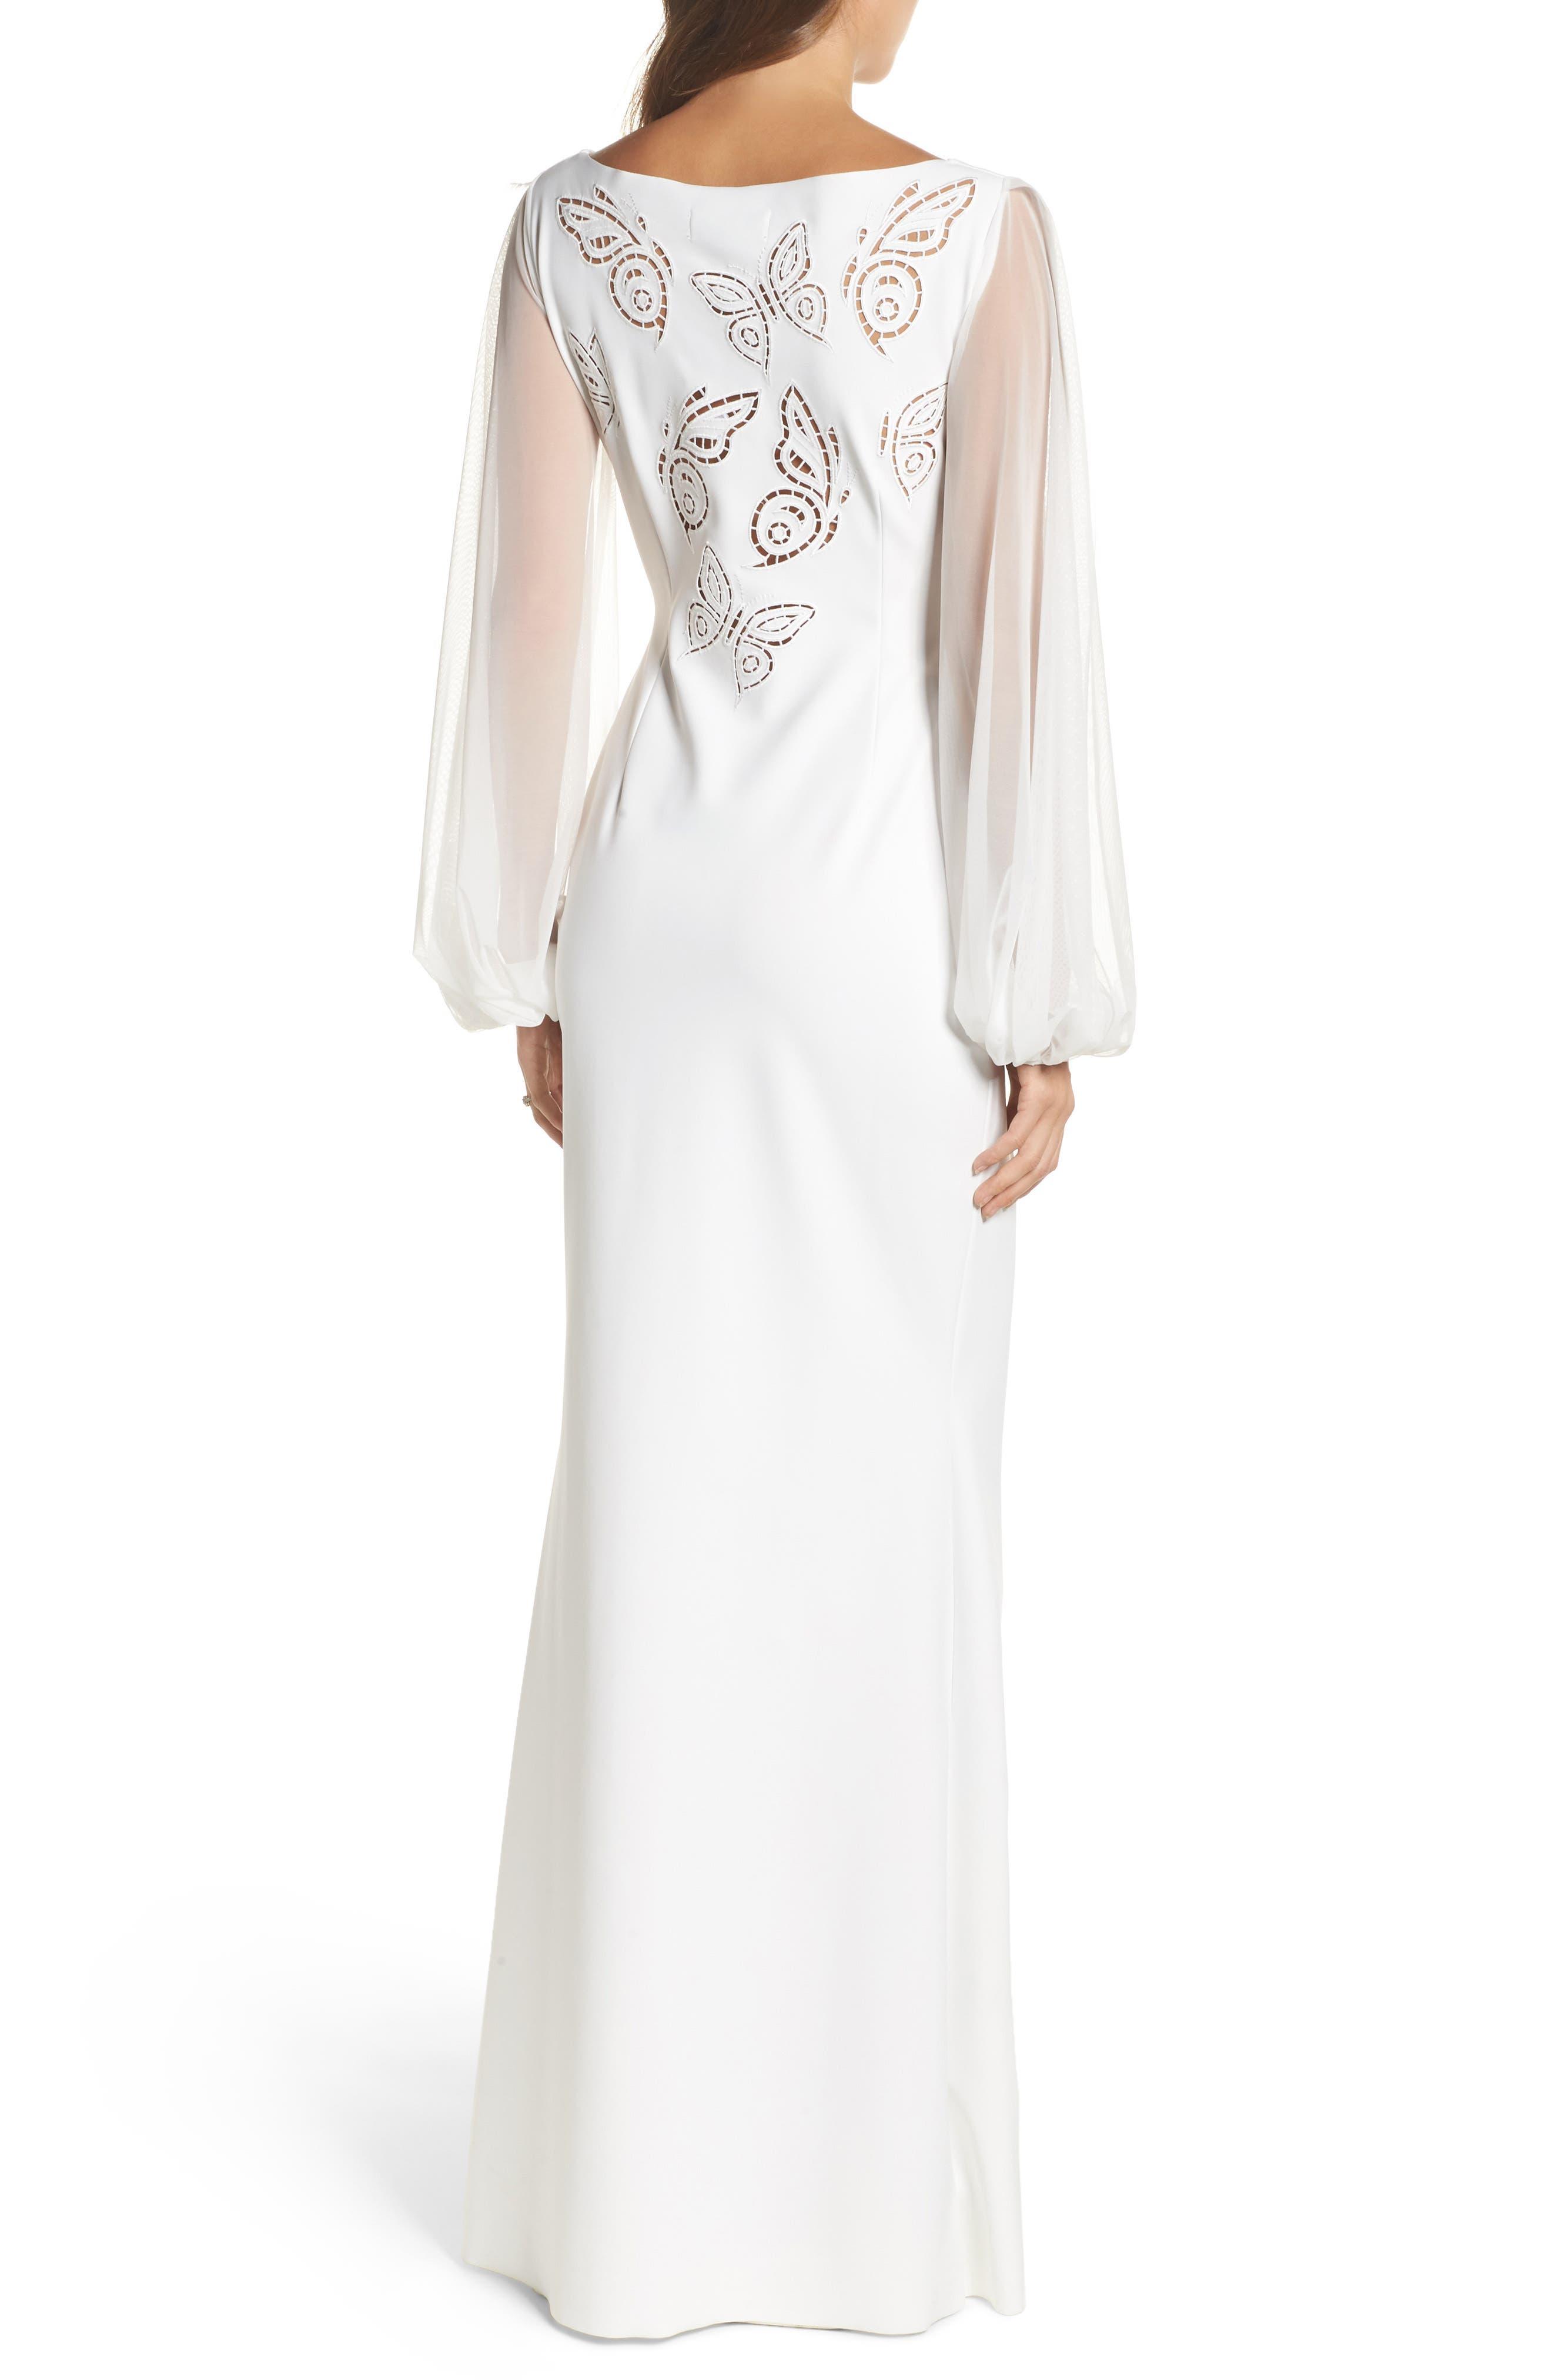 Dress Cutwork Back Gown,                             Alternate thumbnail 2, color,                             100